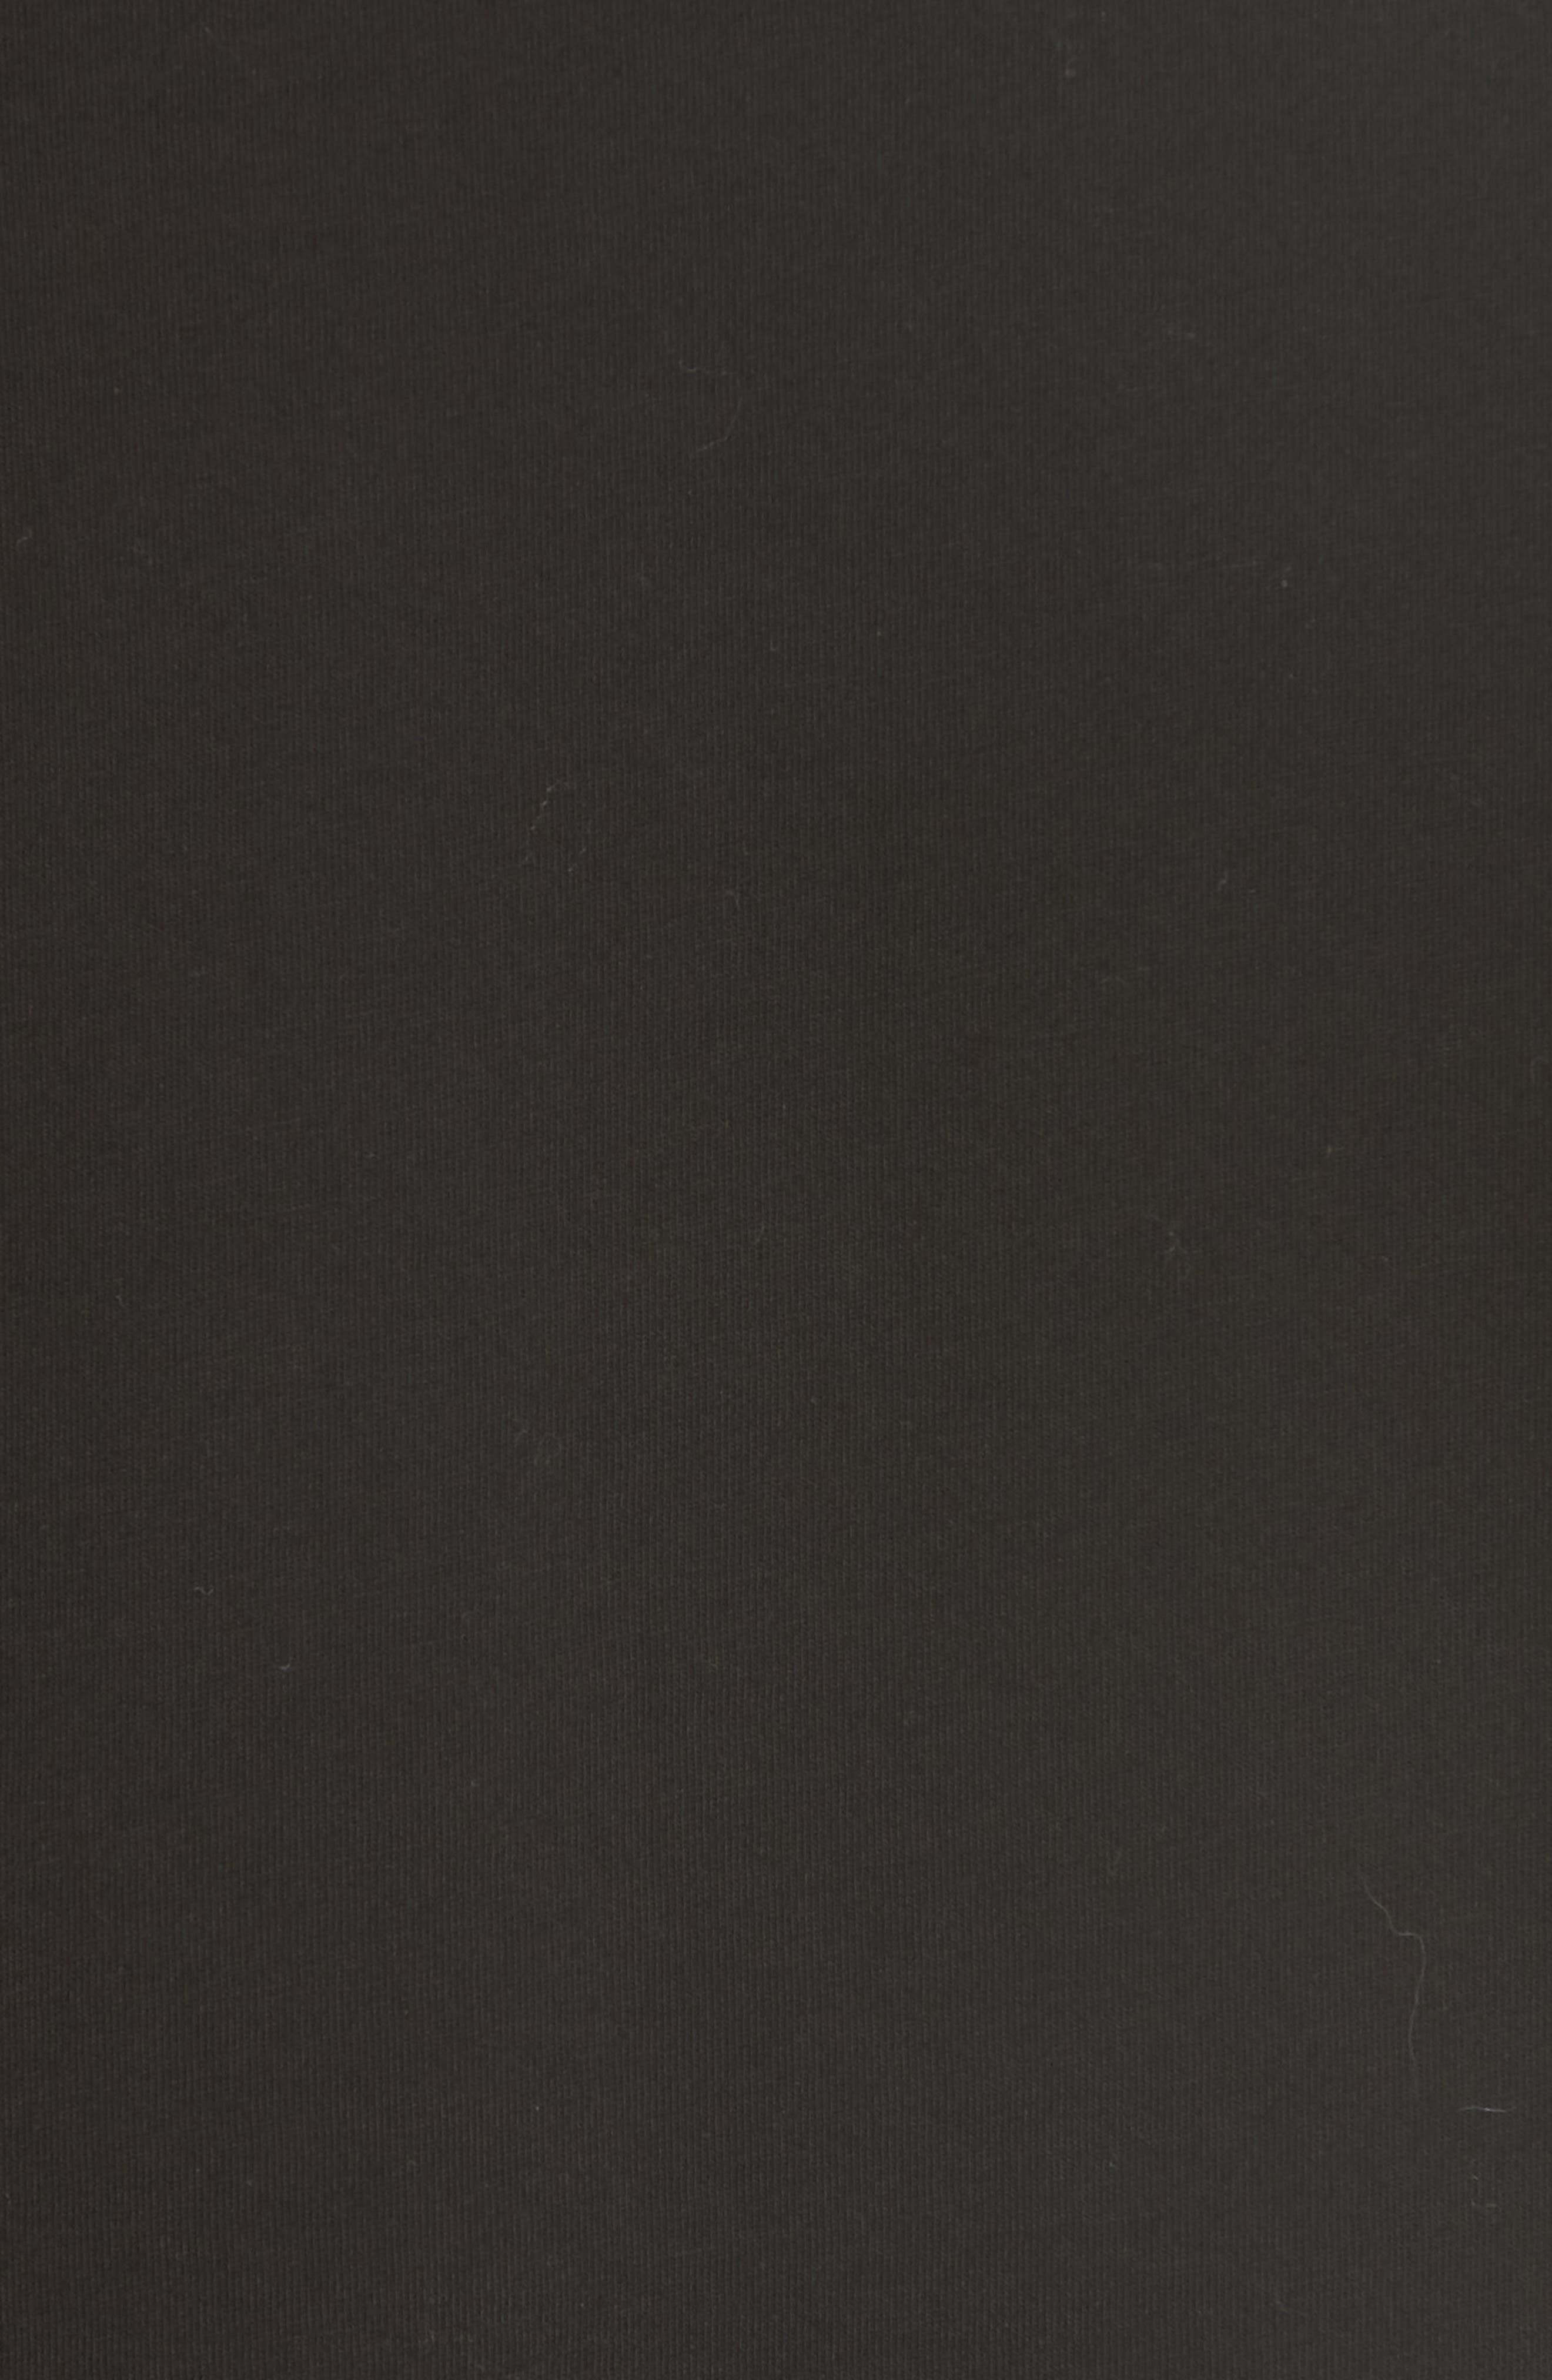 Open Sleeve Top,                             Alternate thumbnail 4, color,                             Black